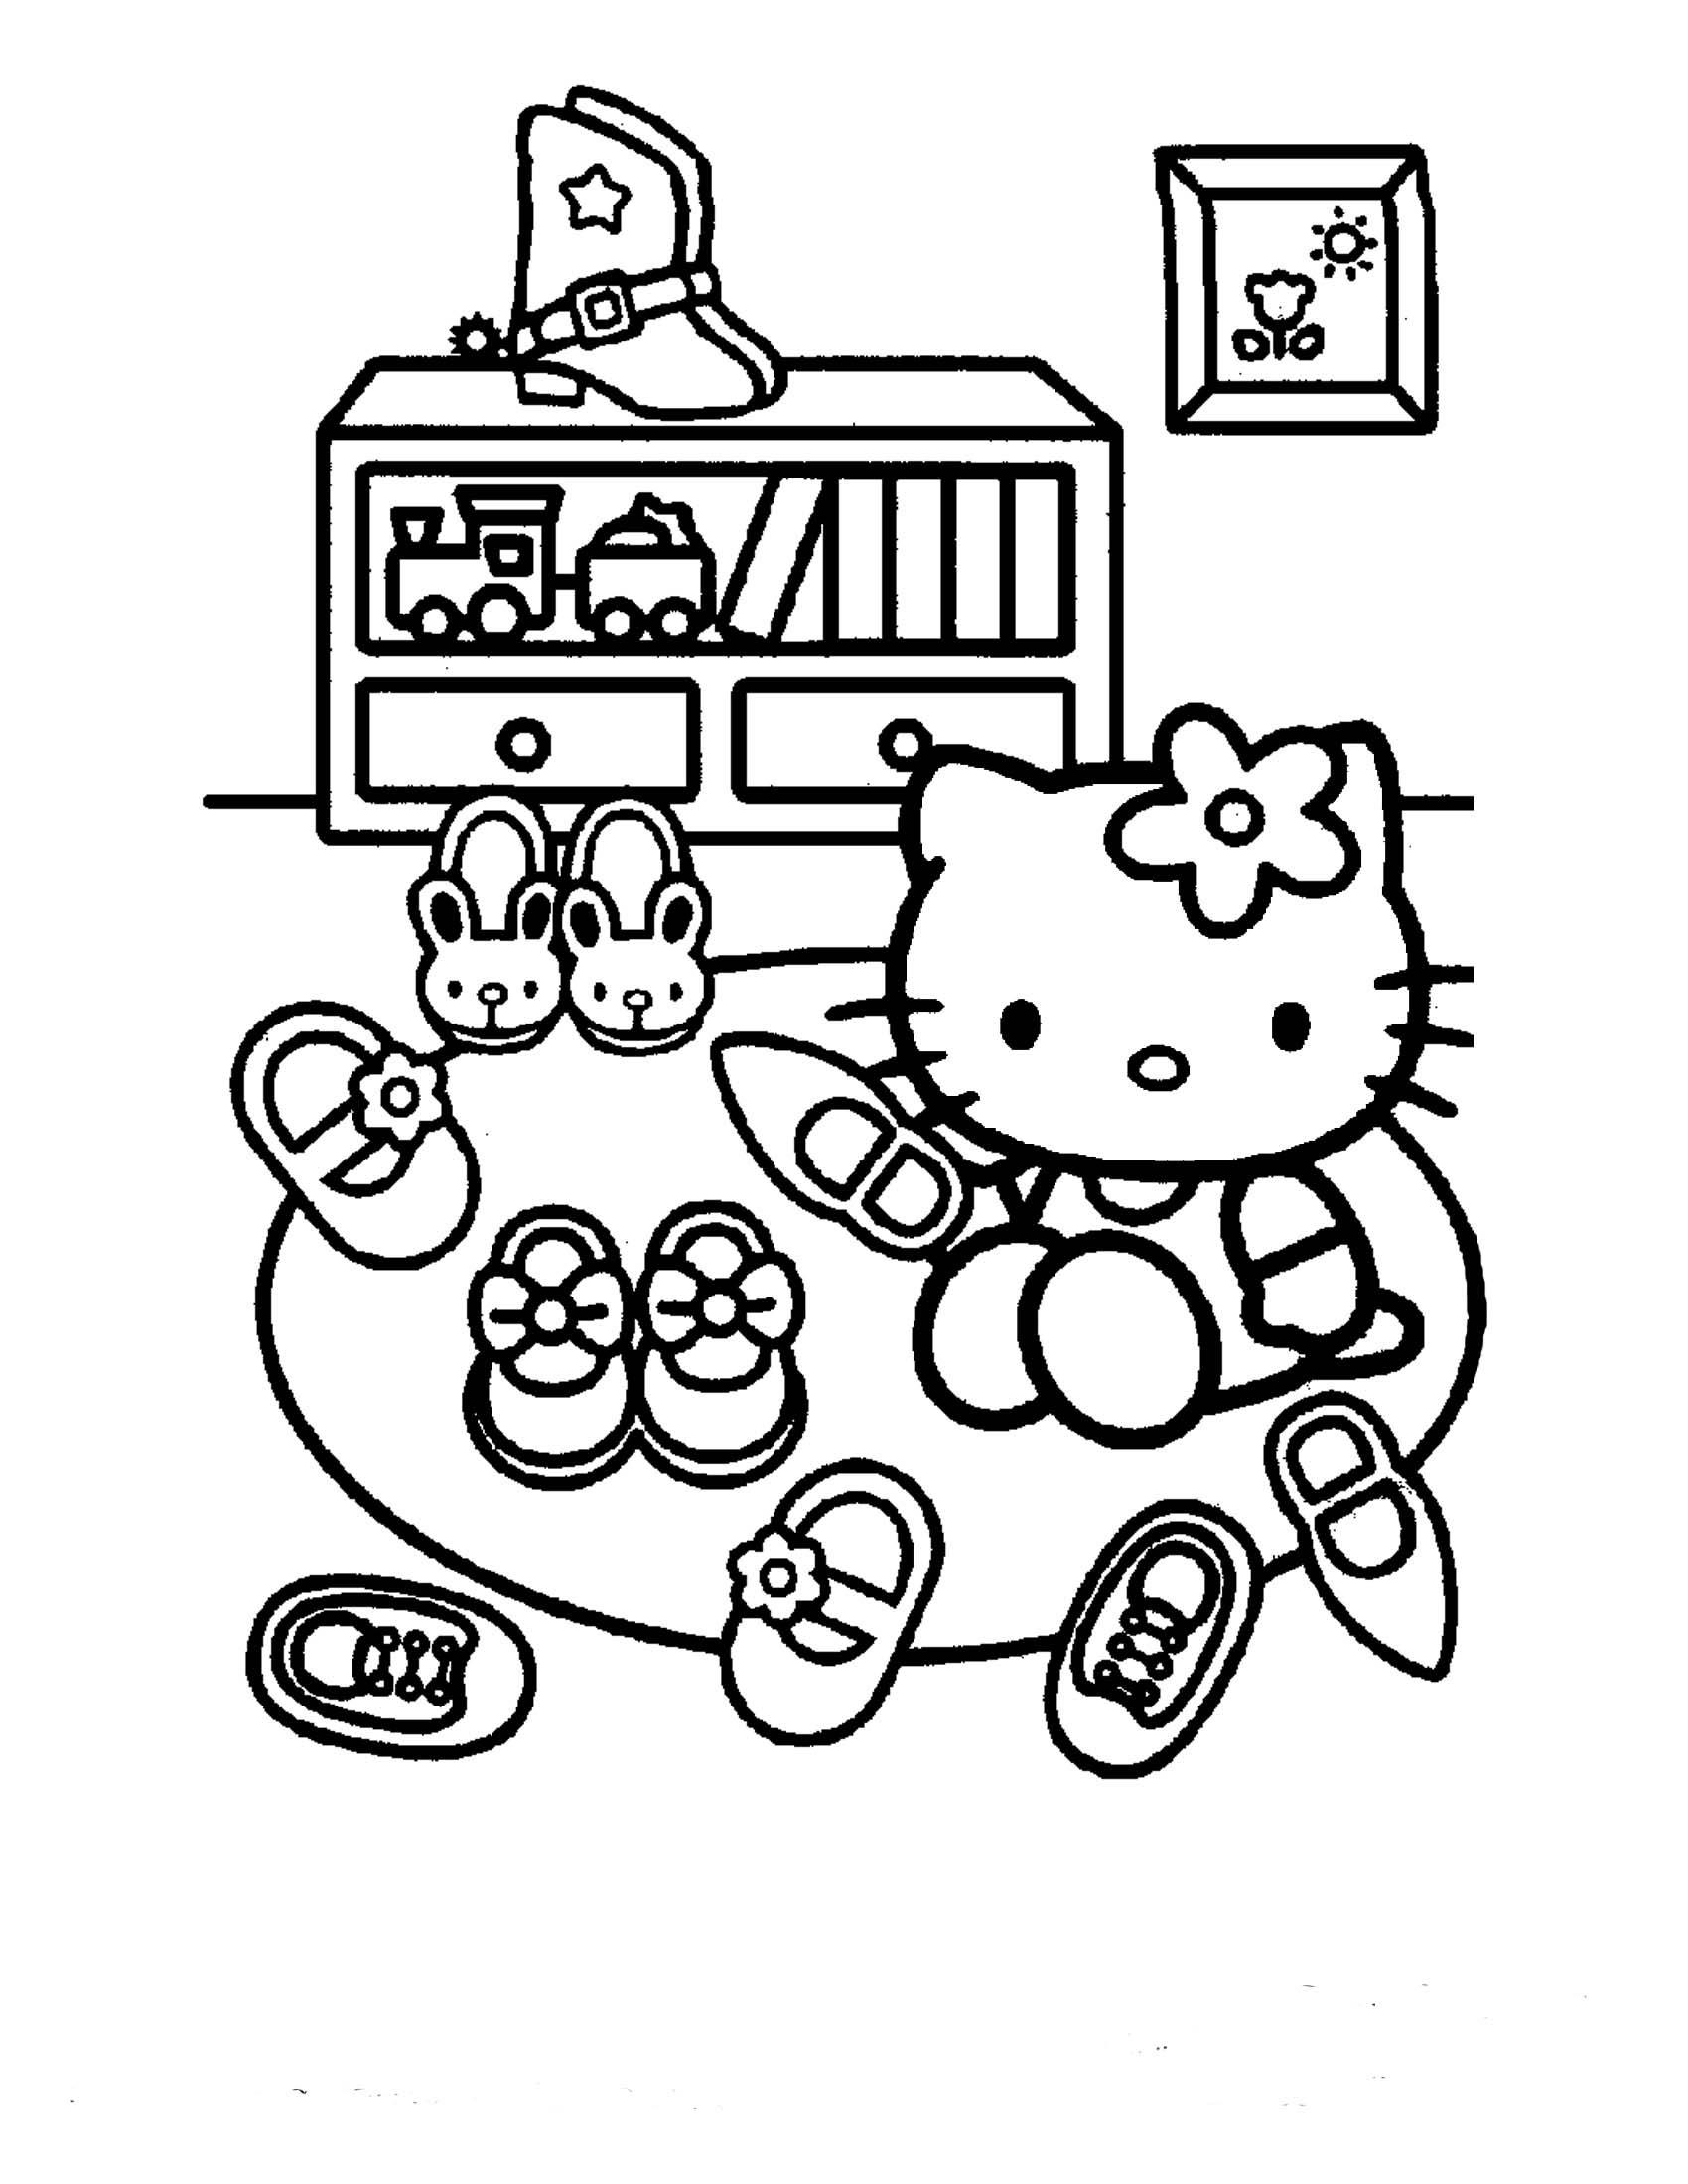 malvorlagen hello kitty meerjungfrau  top kostenlos